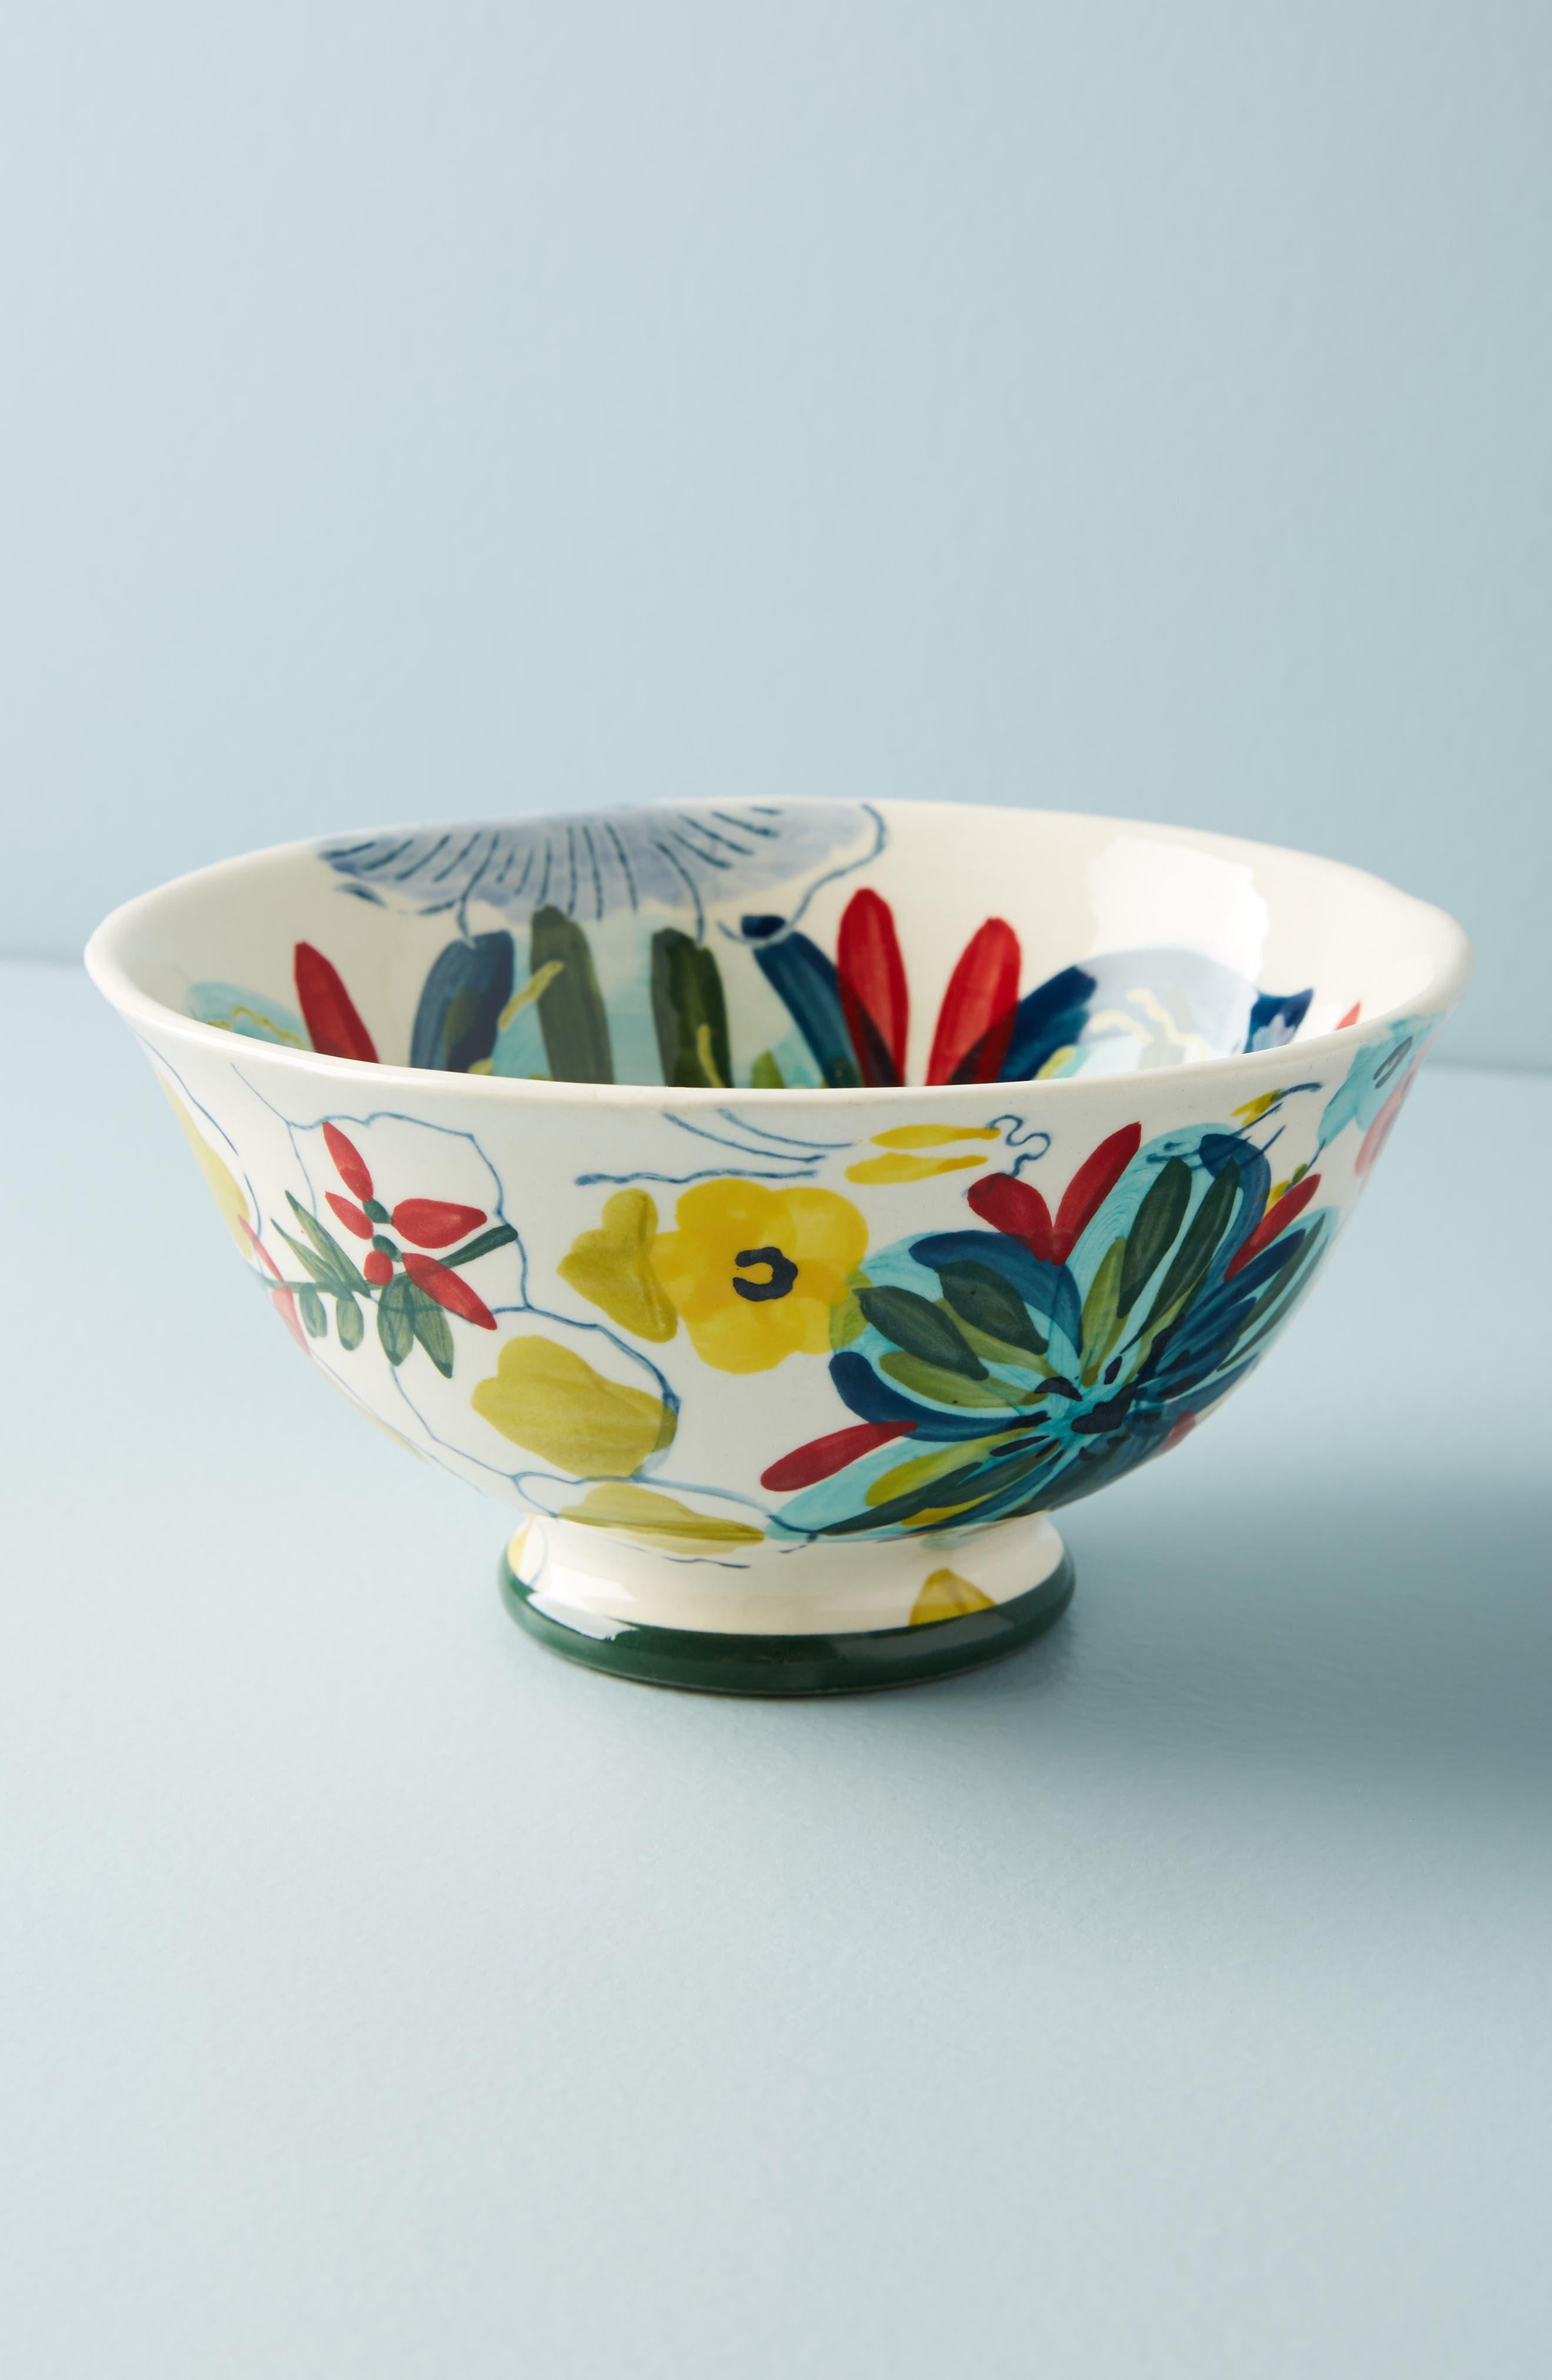 Sissinghurst Castle Stoneware Cereal Bowl,                             Main thumbnail 1, color,                             Navy Multi